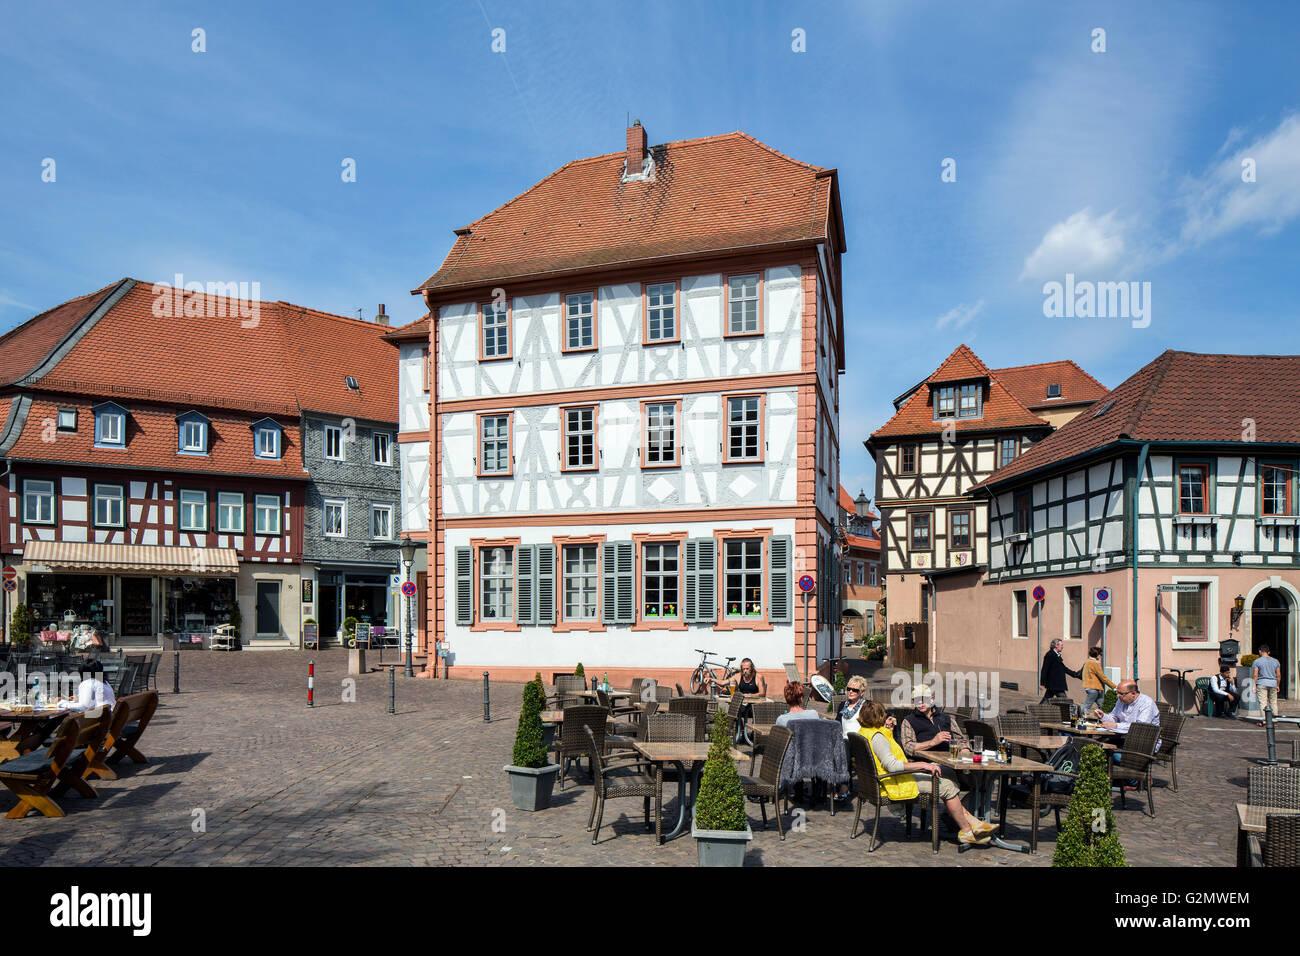 Old Schoolhouse 1703, historic centre, Seligenstadt, Hesse, Germany - Stock Image